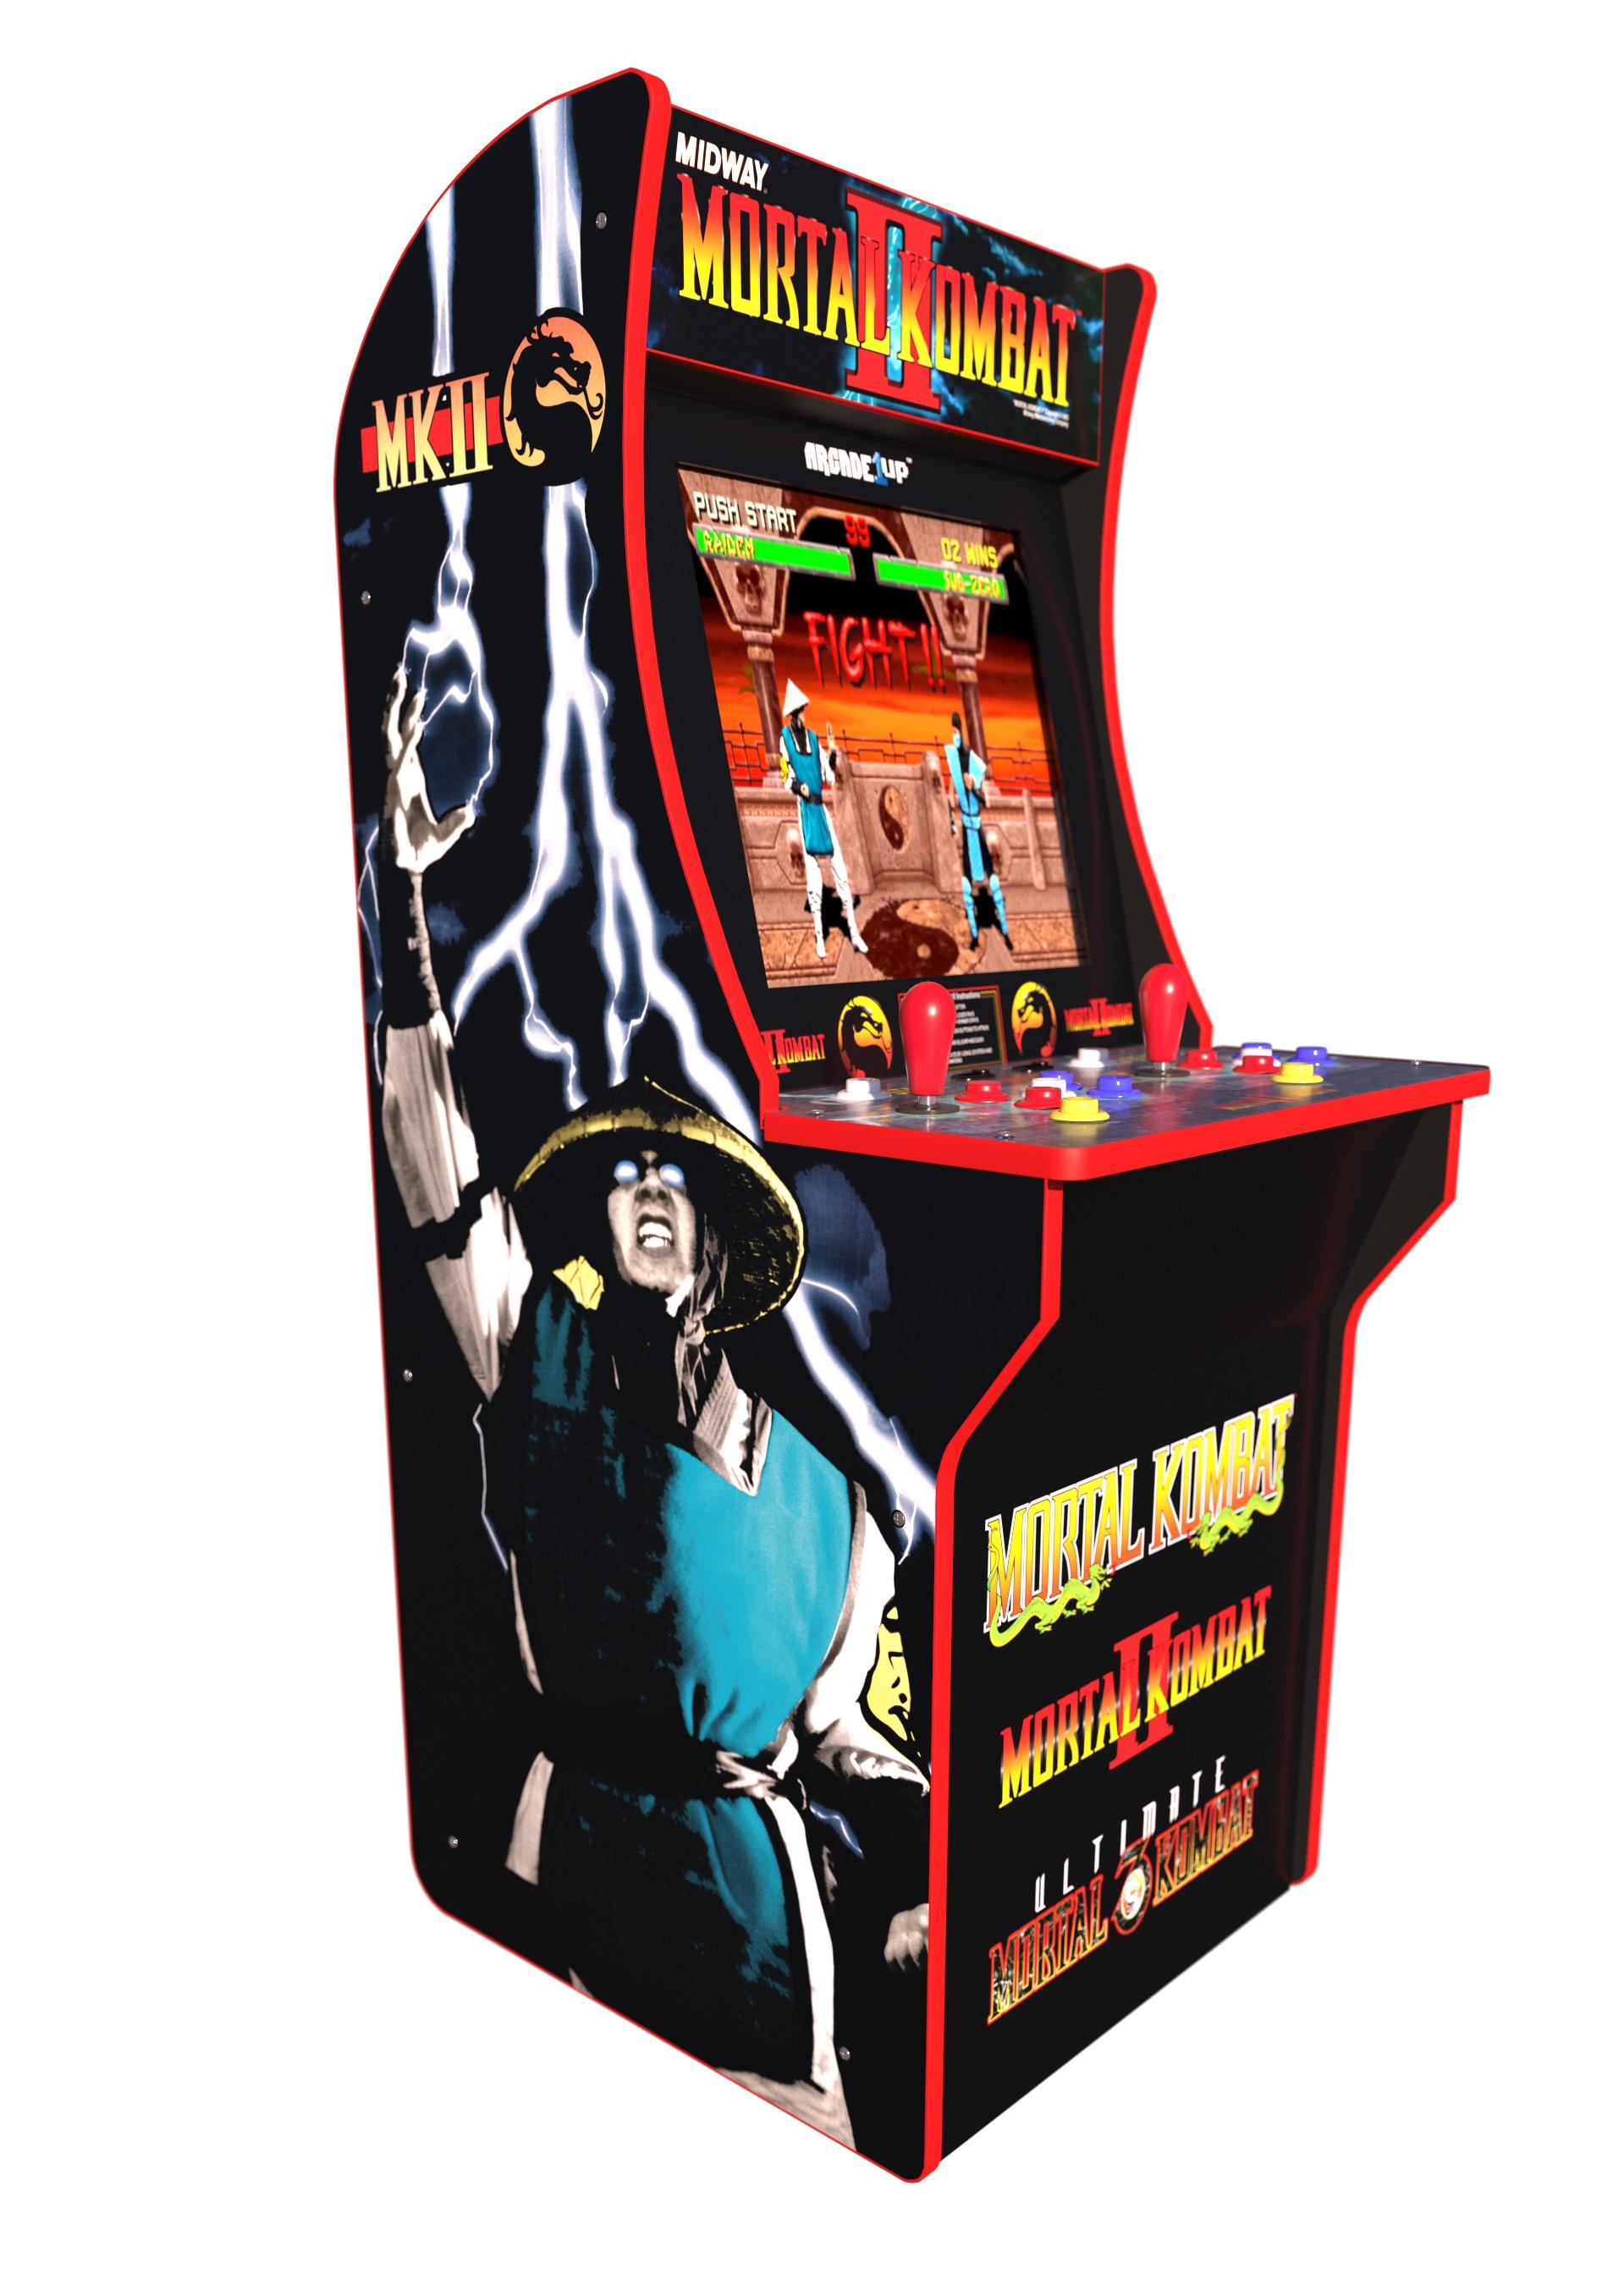 Mortal Kombat Arcade Machine, Arcade1UP, 4ft (Includes Mortal Kombat I,II, III)  -$199. - Walmart